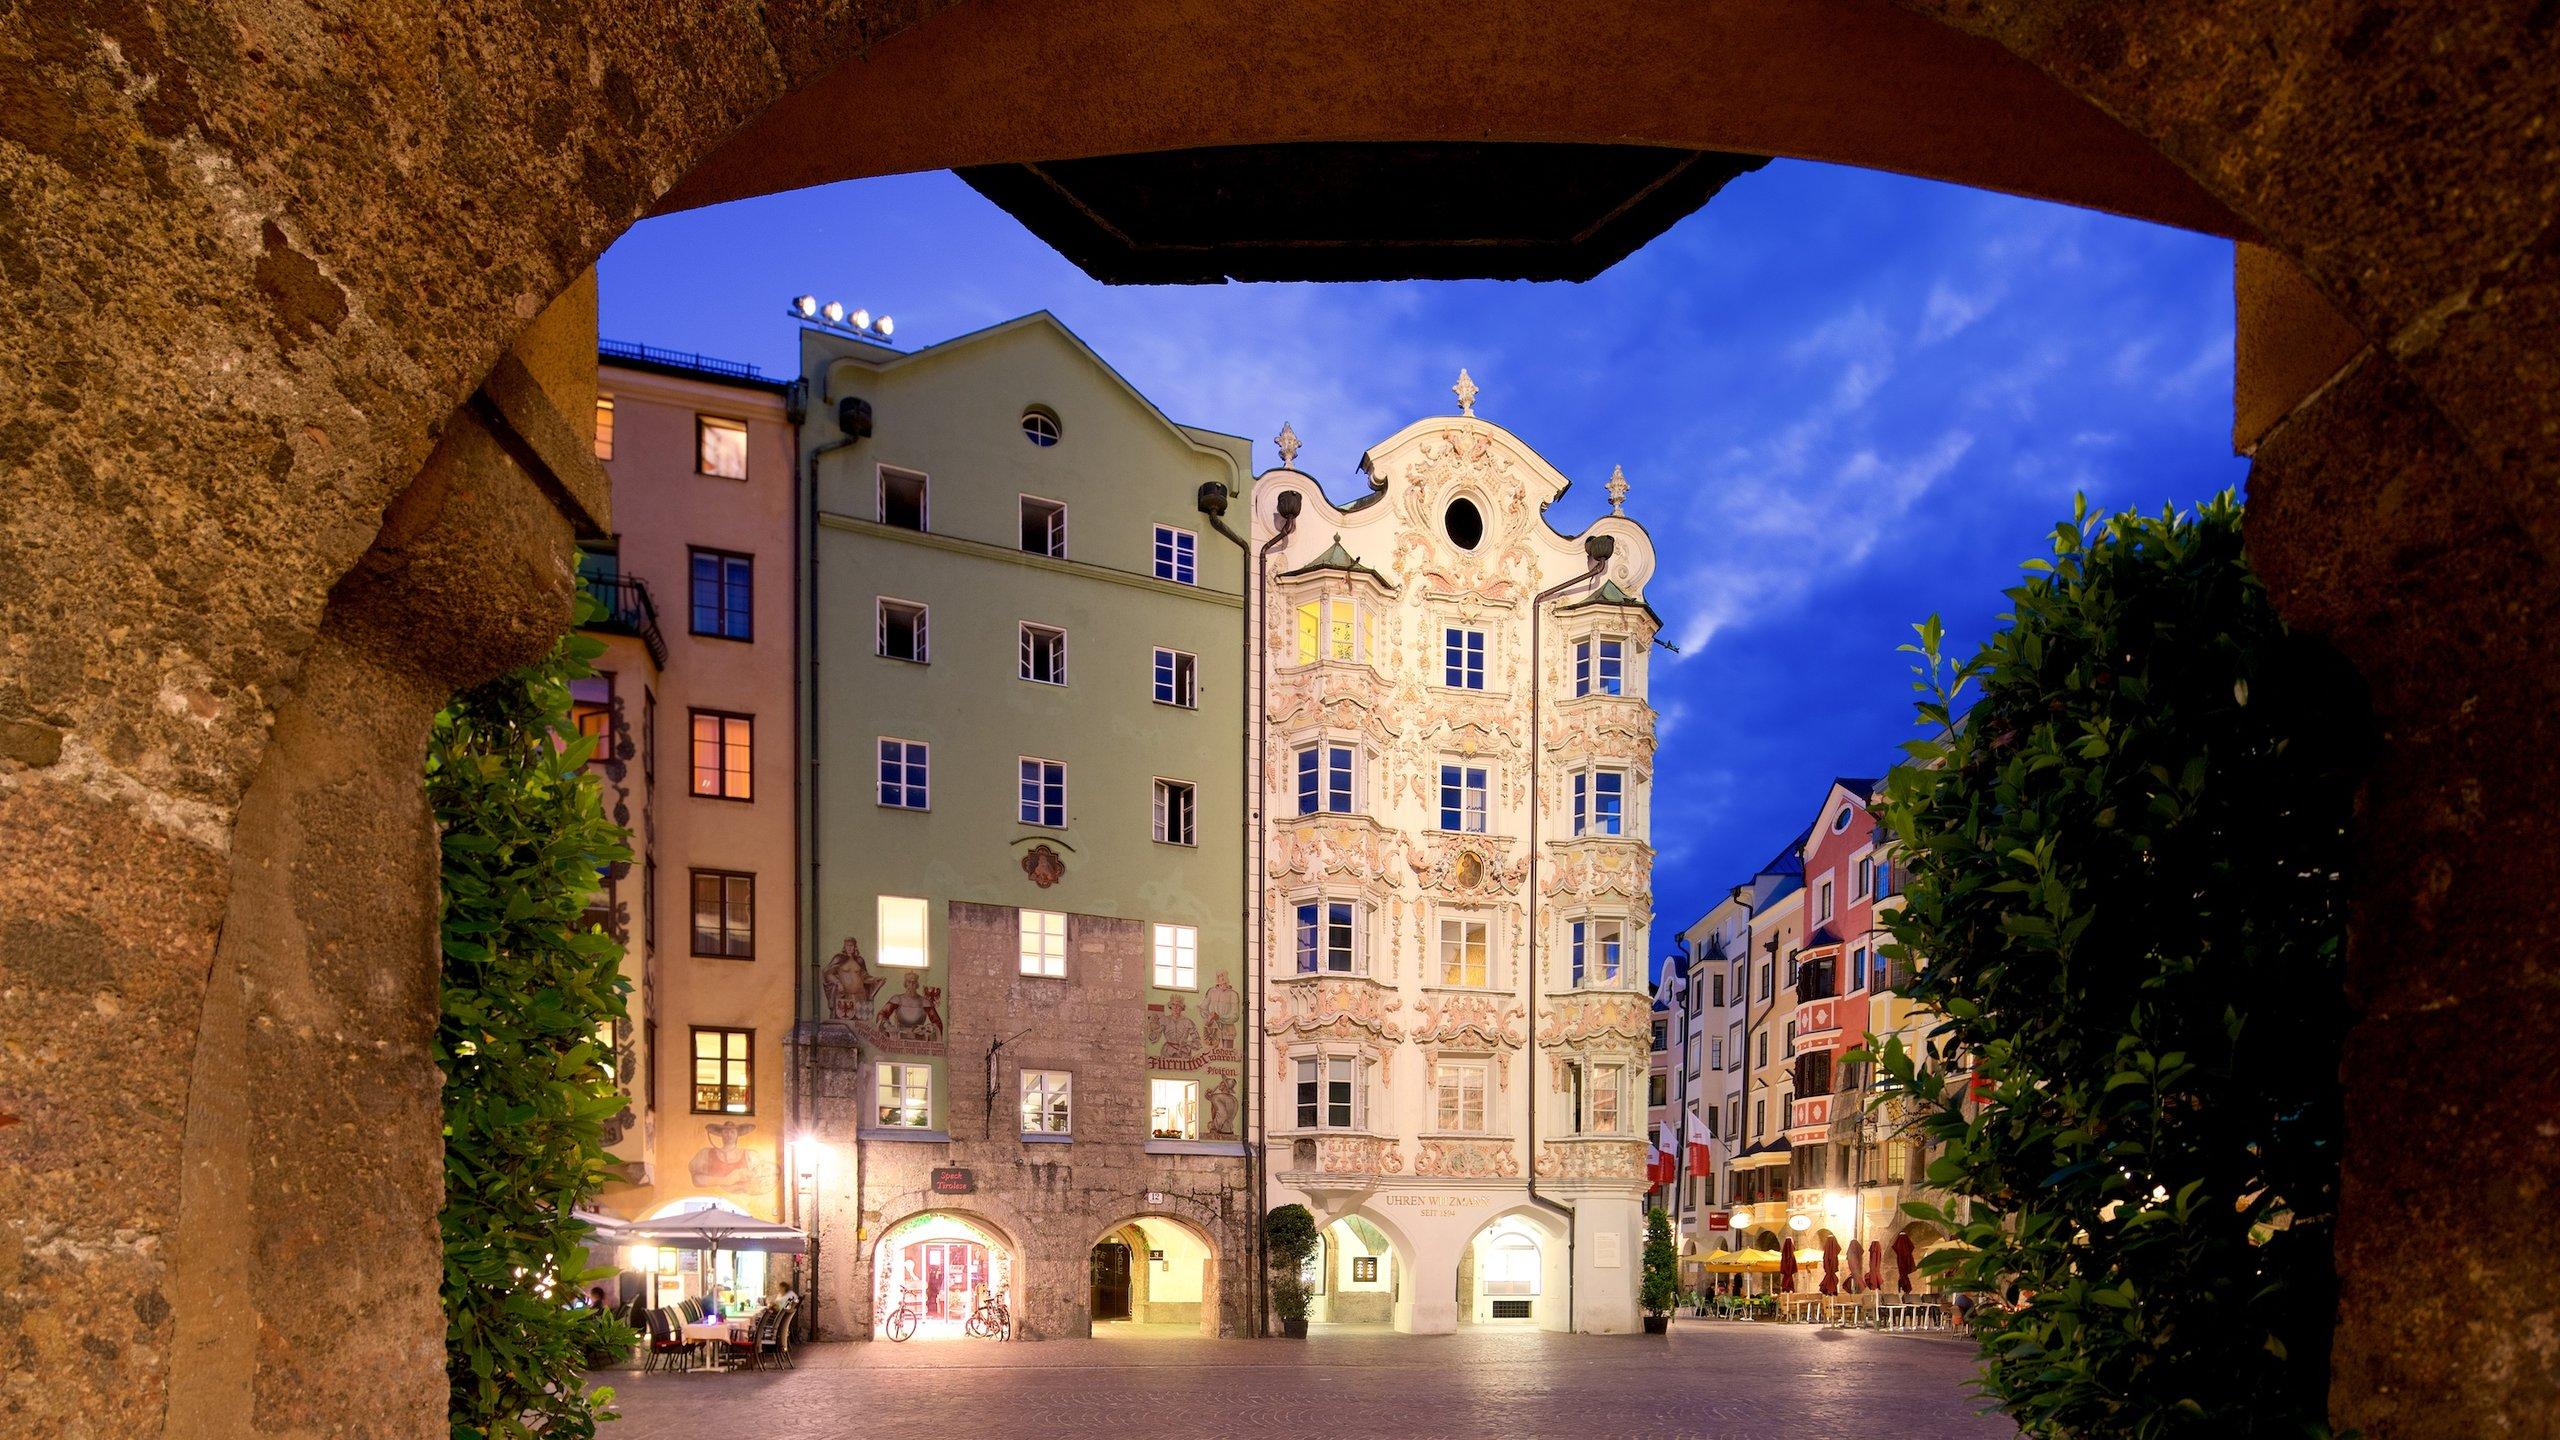 Altstadt, Innsbruck, Tyrol, Austria